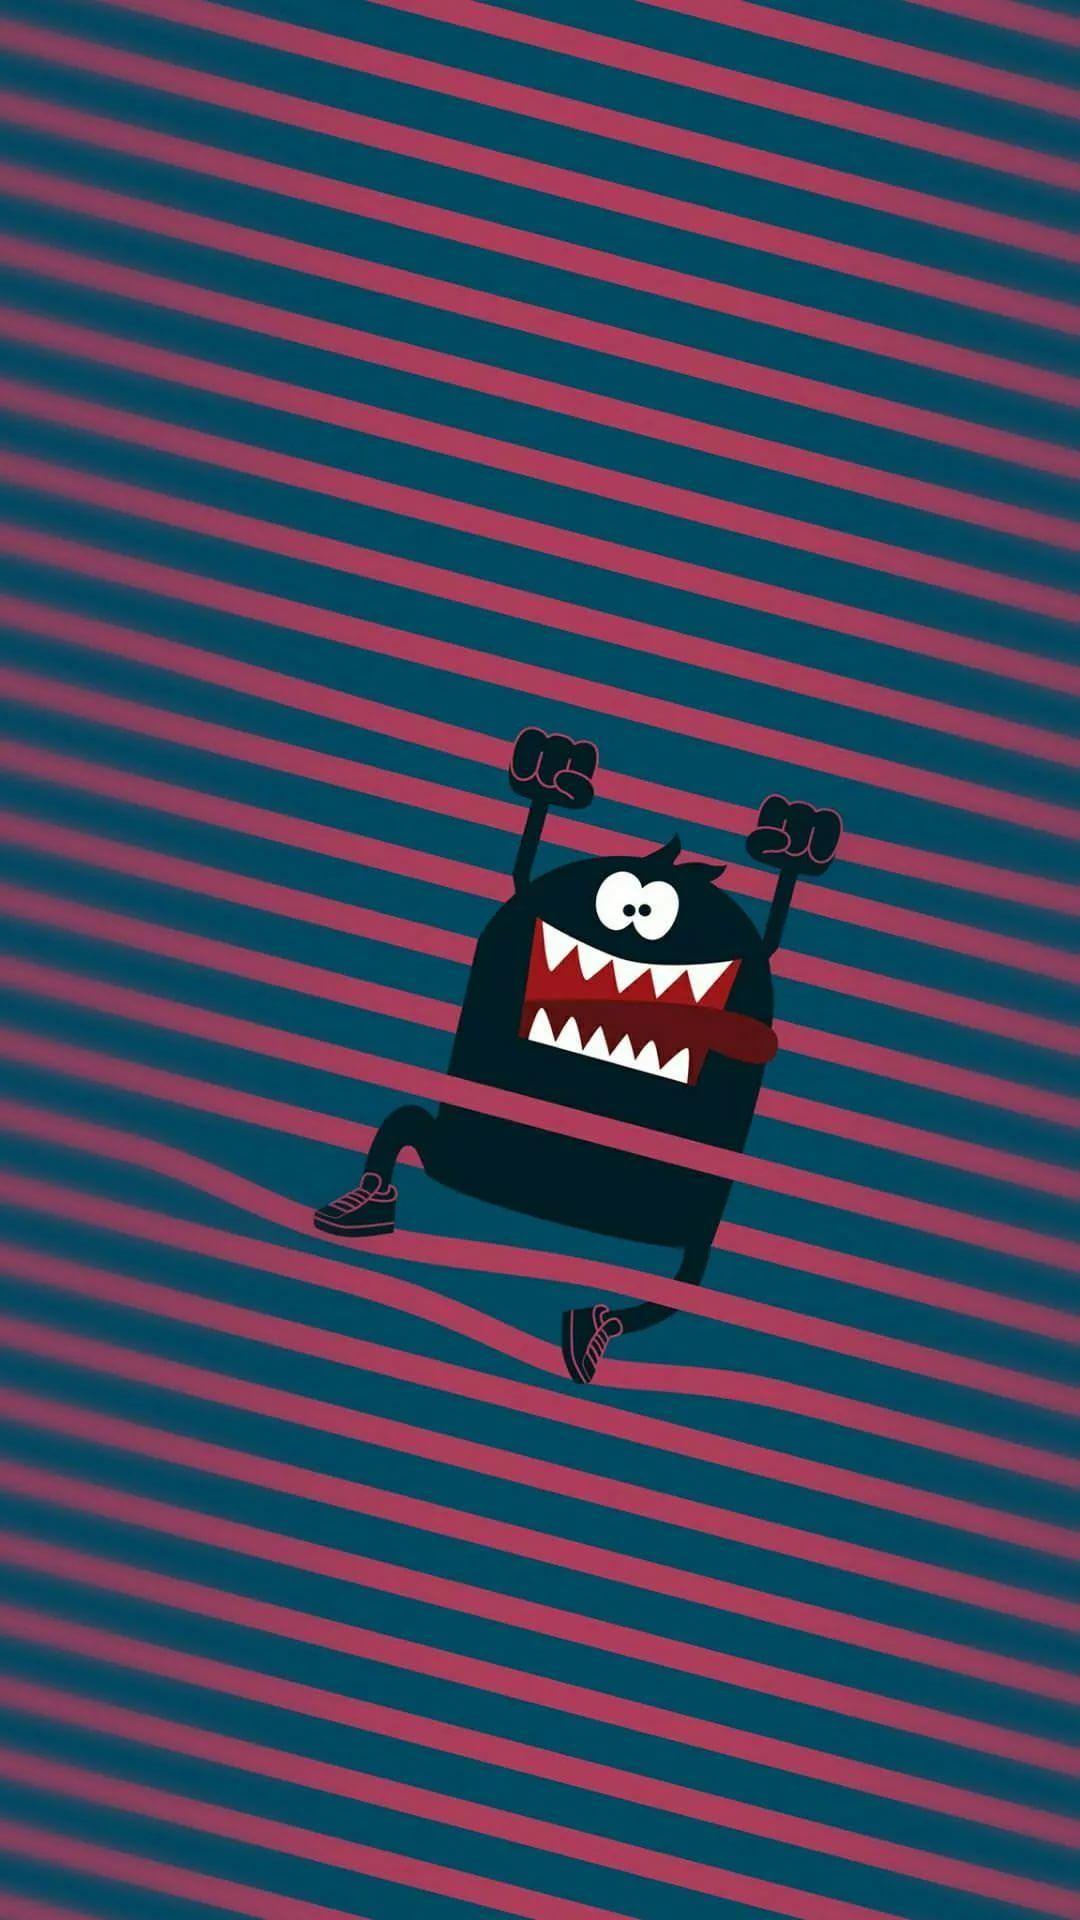 Funny iPhone 6 wallpaper